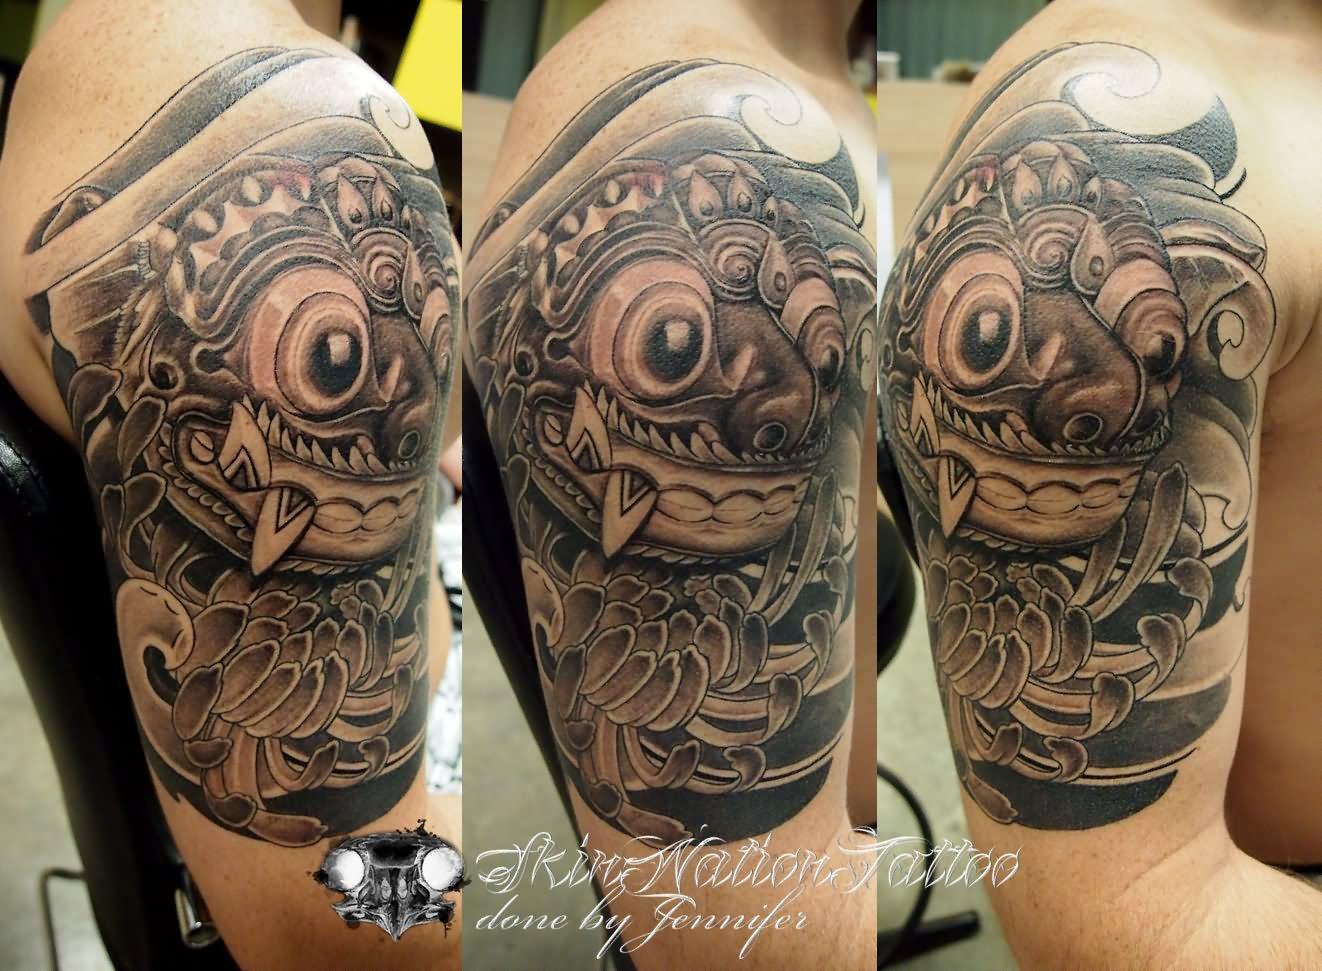 Tattoo Designs: 9 Most Popular Barong Tattoo Designs